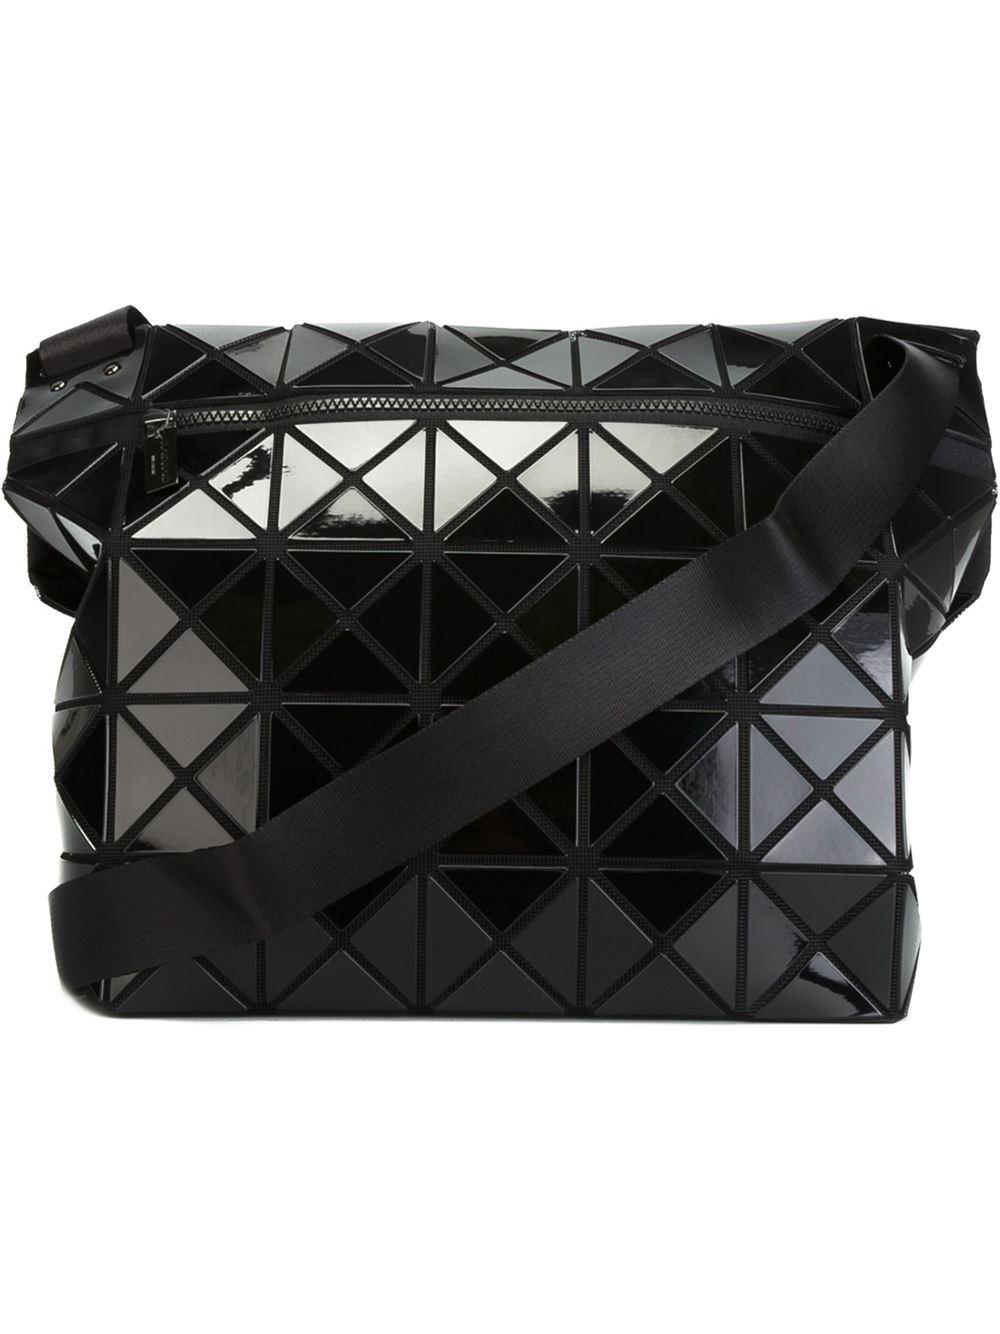 b128cab7b0 Lyst - Bao Bao Issey Miyake  rock Basic  Shoulder Bag in Black